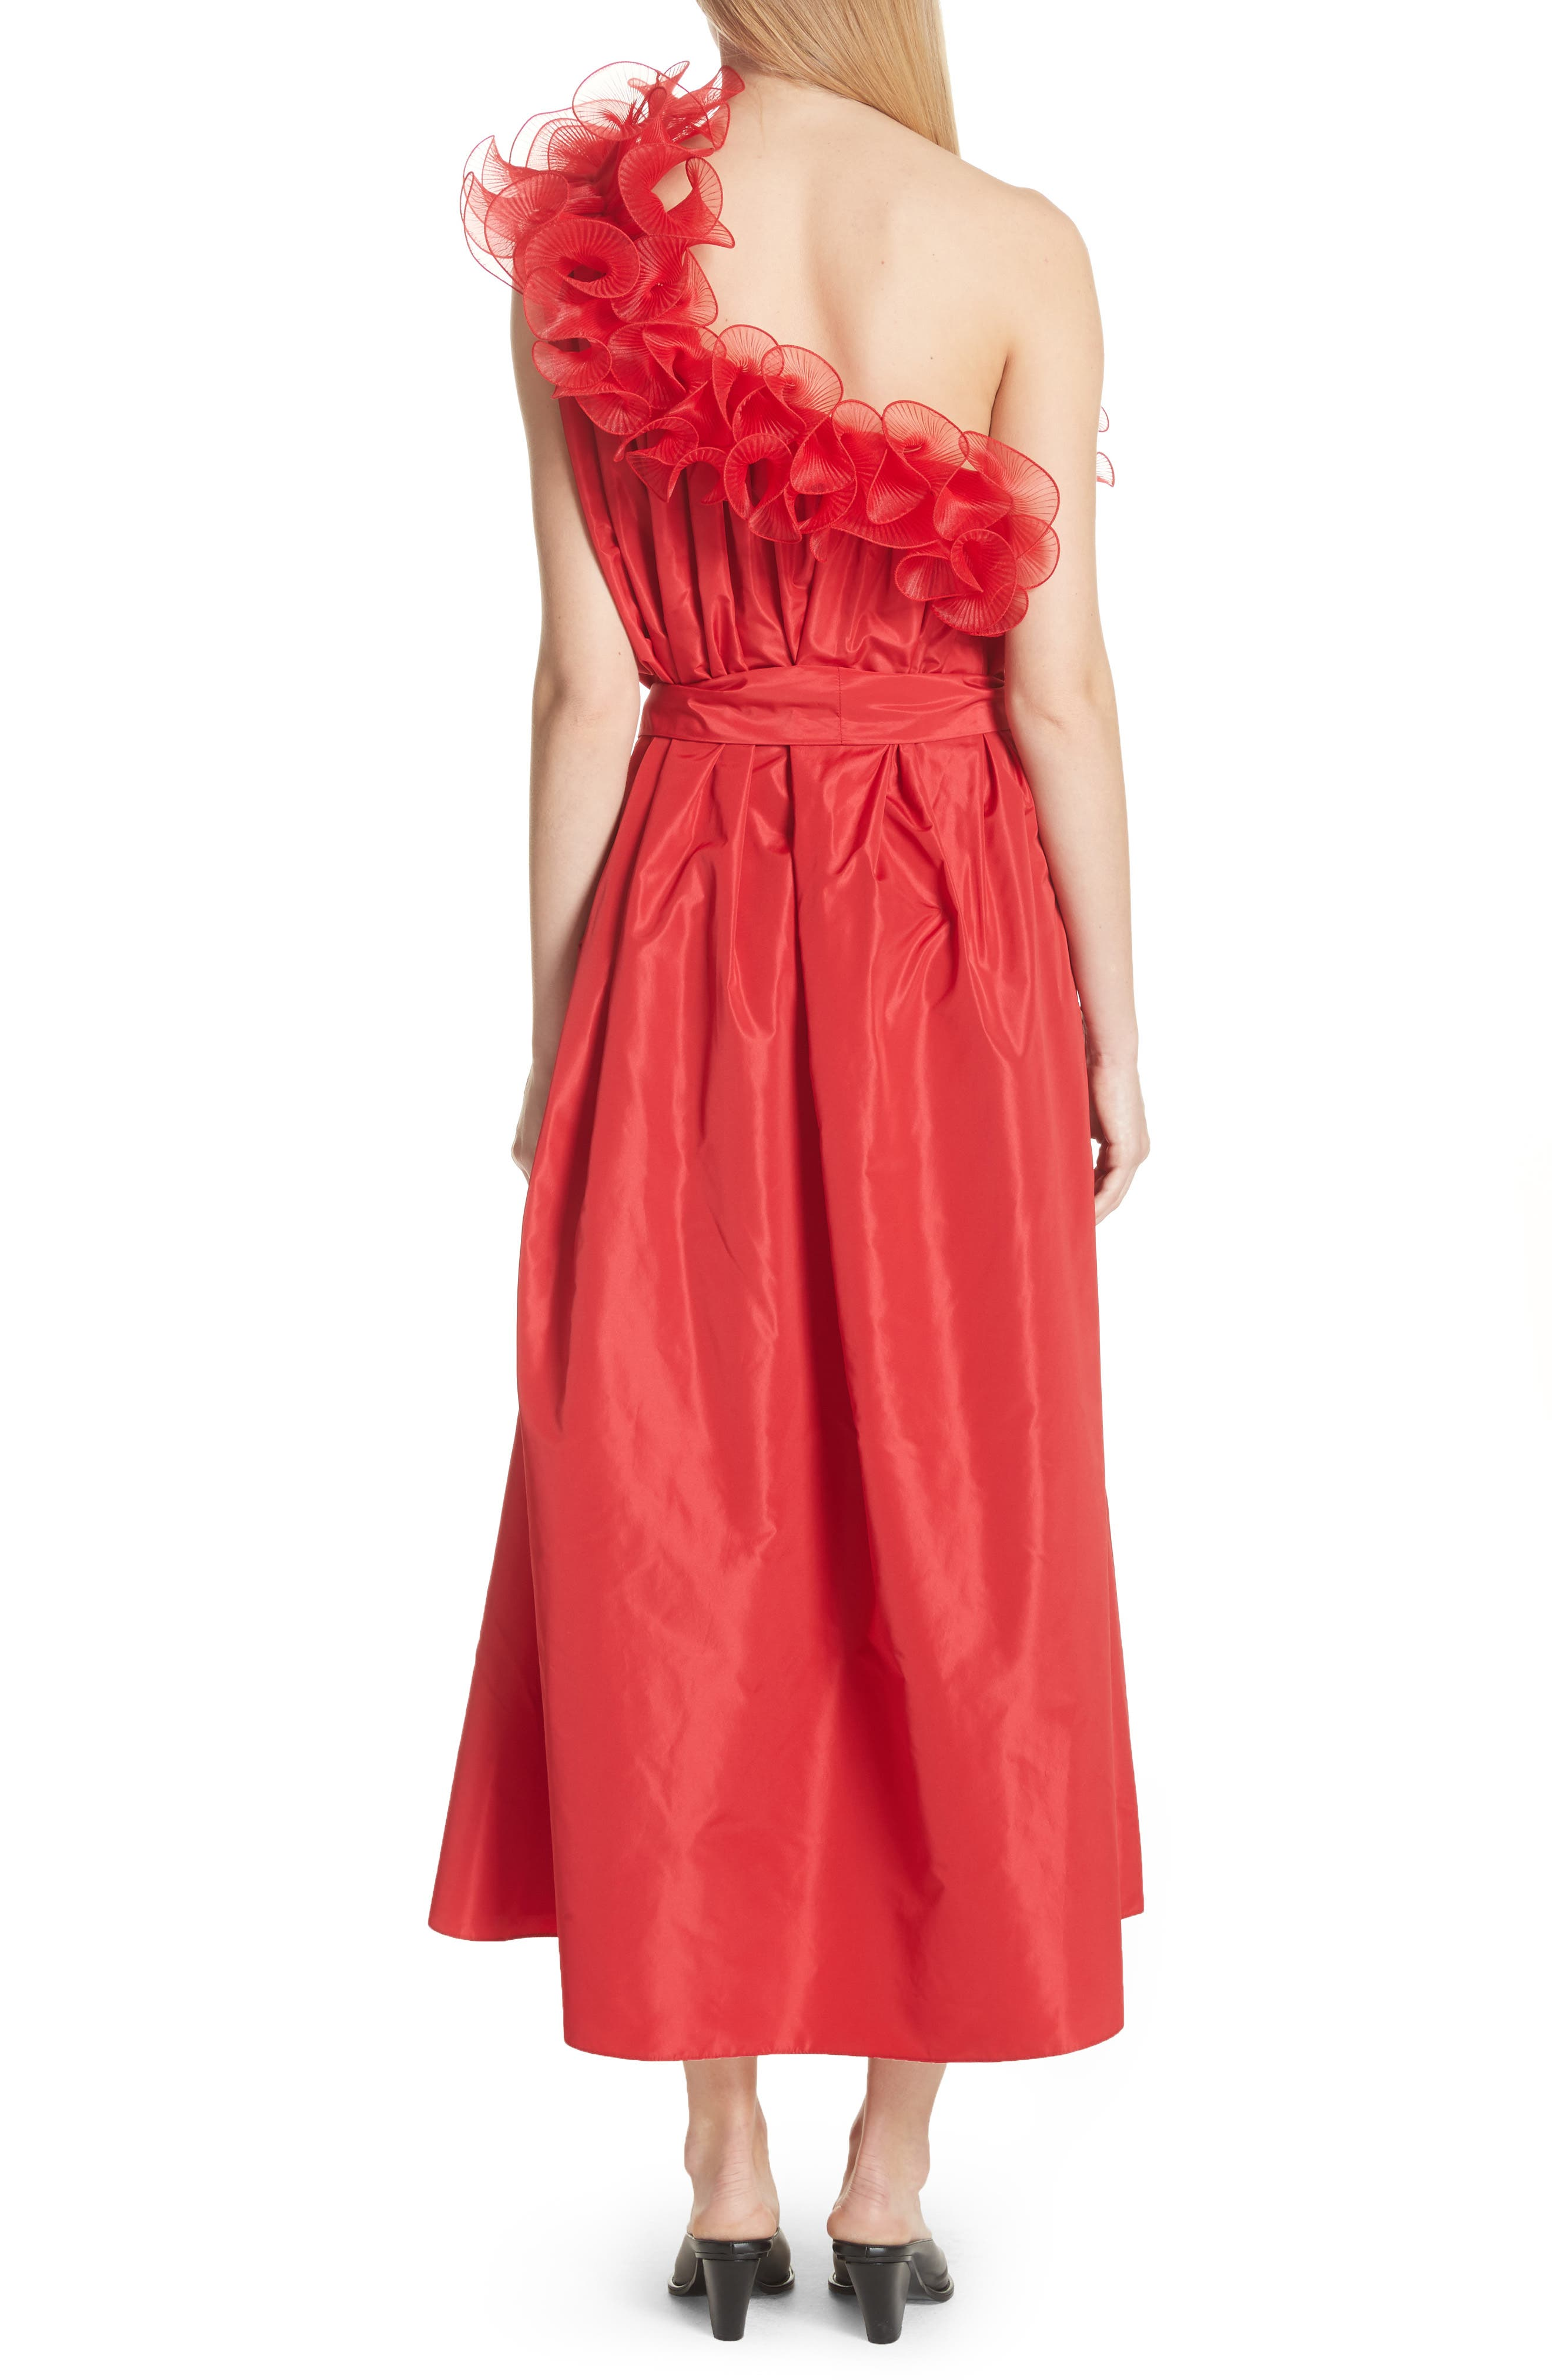 One-Shoulder Ruffle Taffeta Dress,                             Alternate thumbnail 2, color,                             641